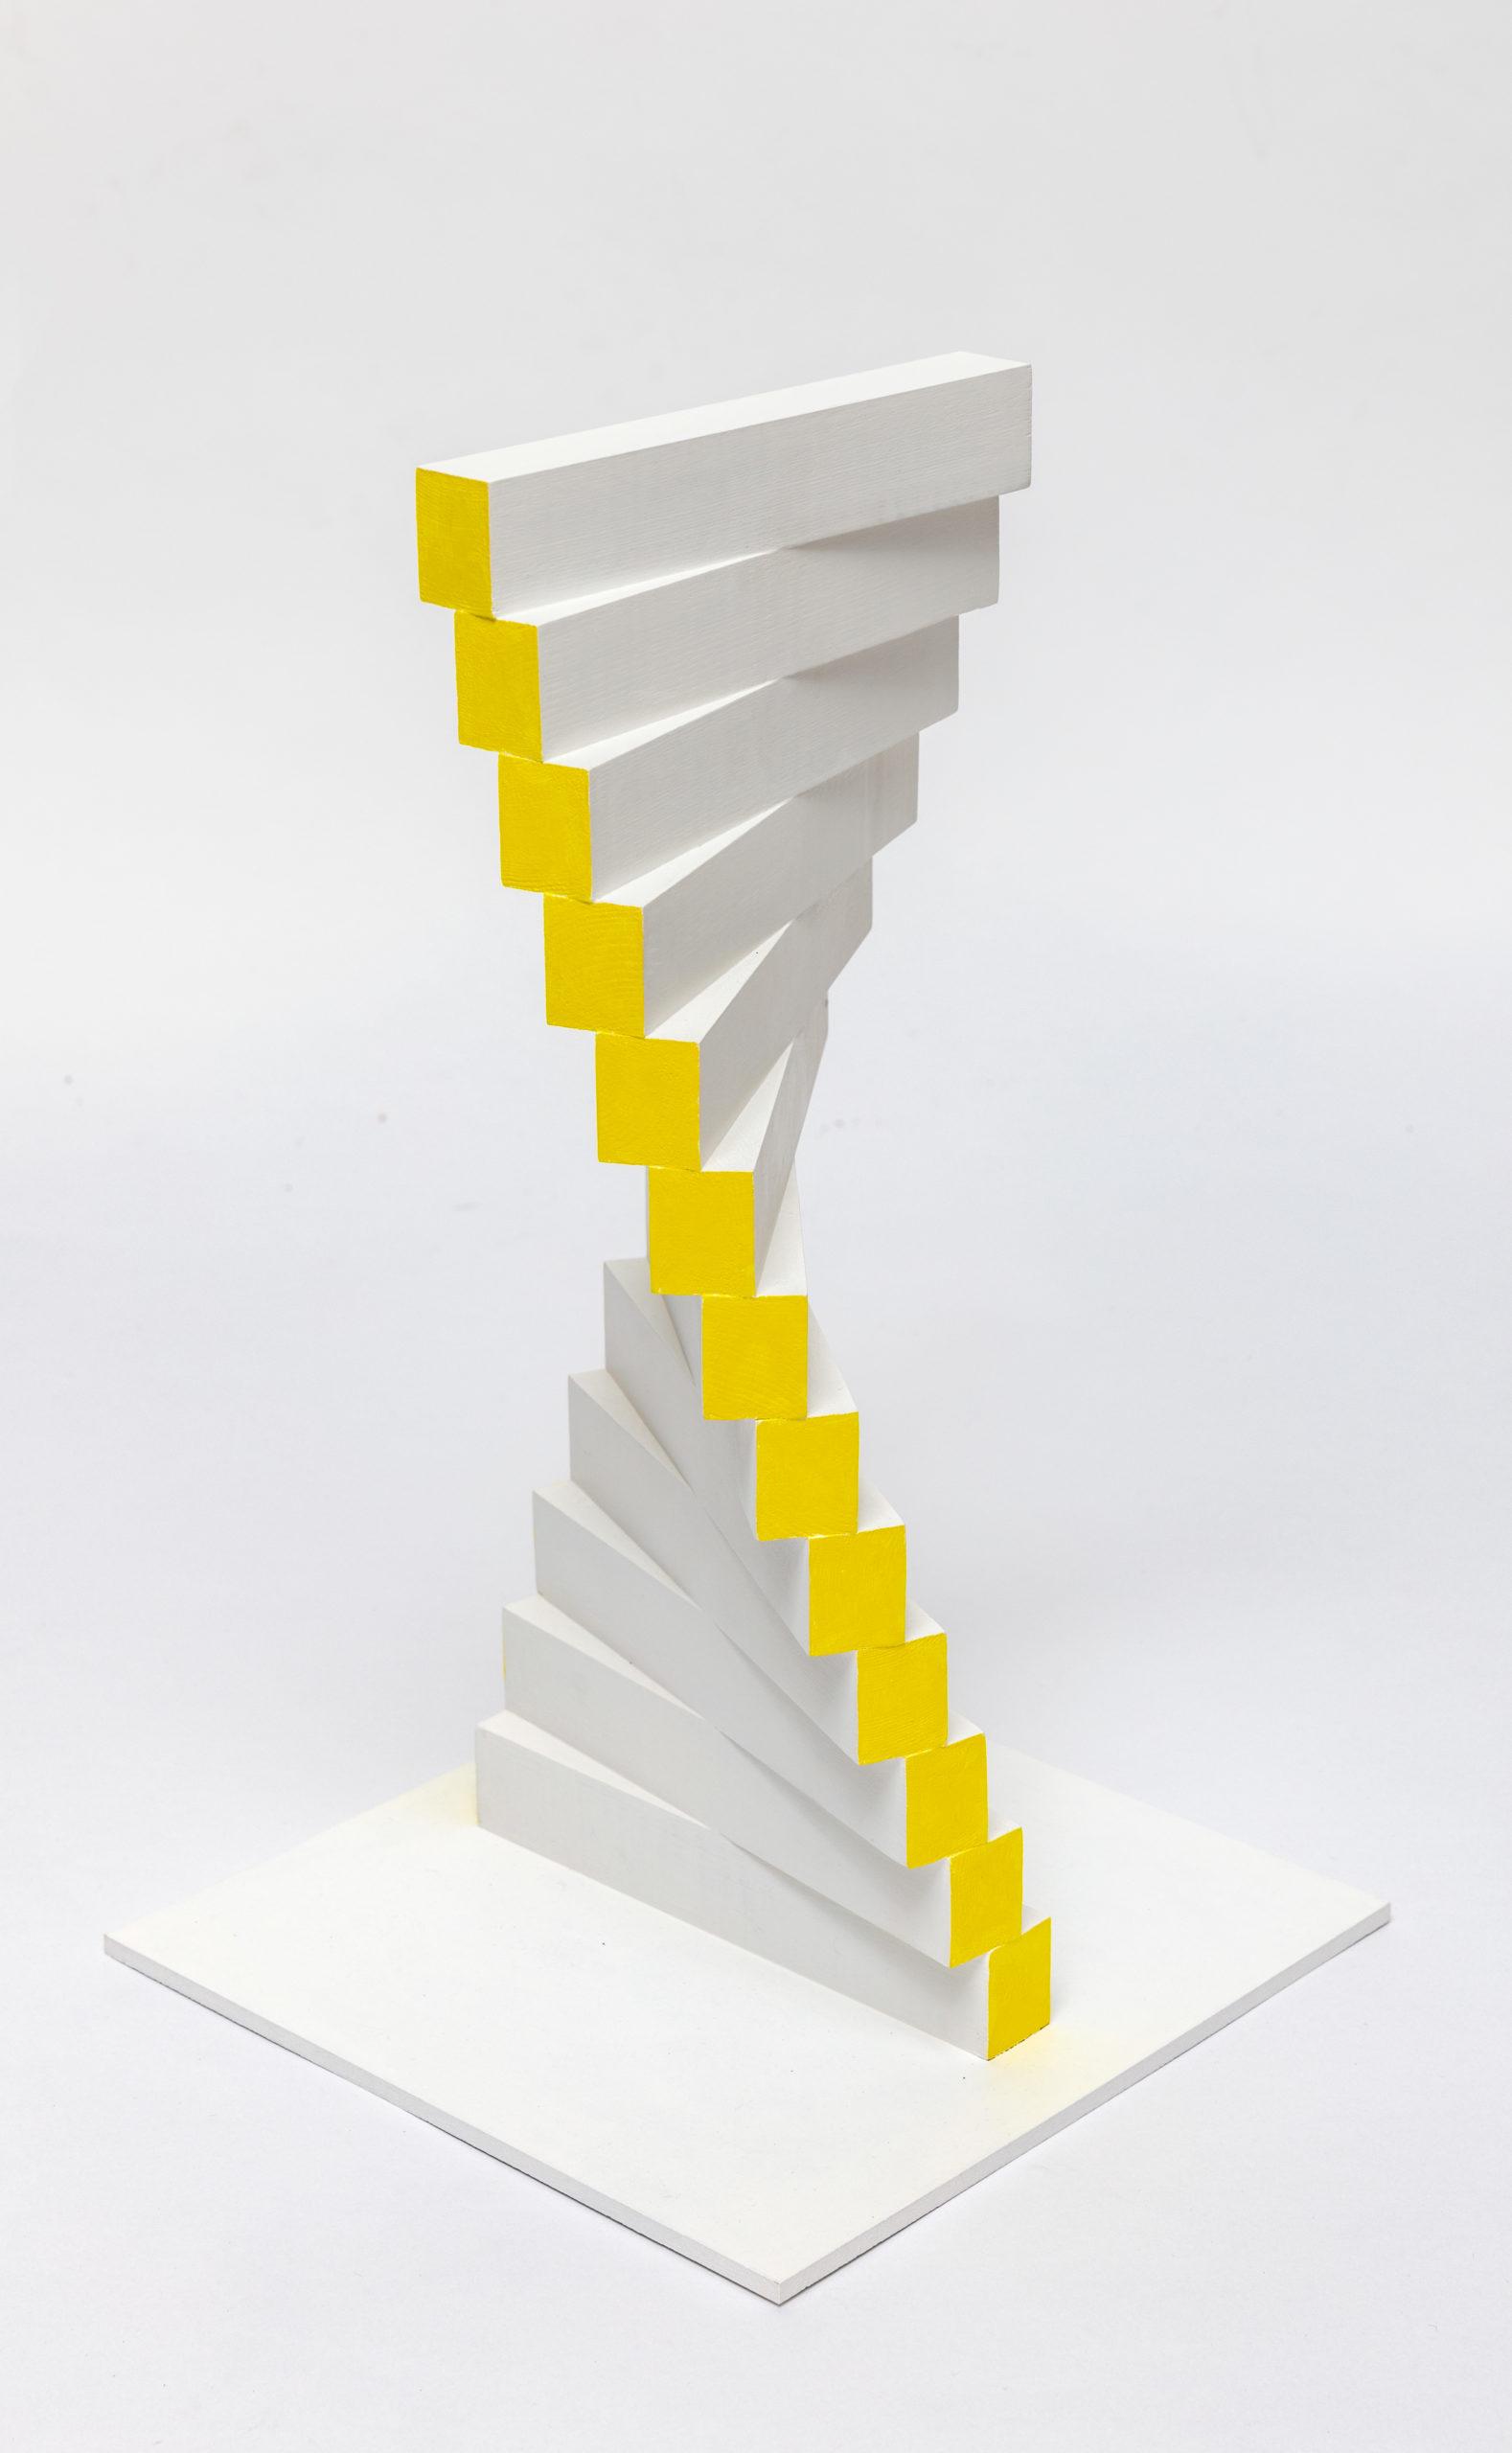 MILIJA BELIC, Glissandi jaune, 2016, Holz bemalt, 44x20x20cm